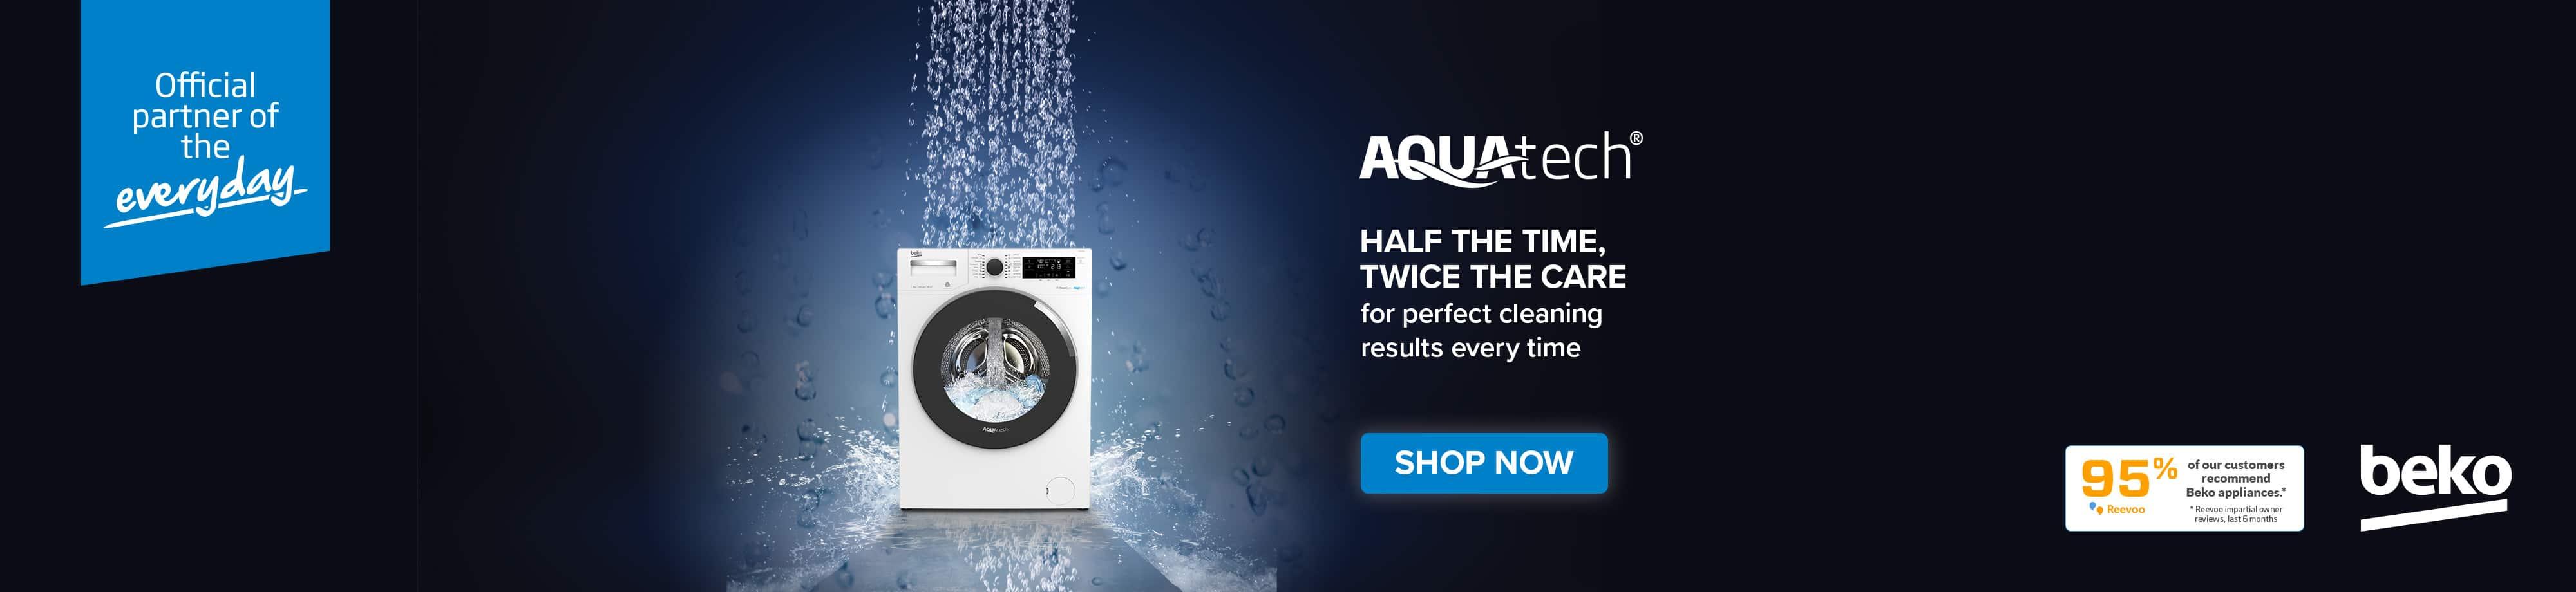 beko aquatech homepage desktop